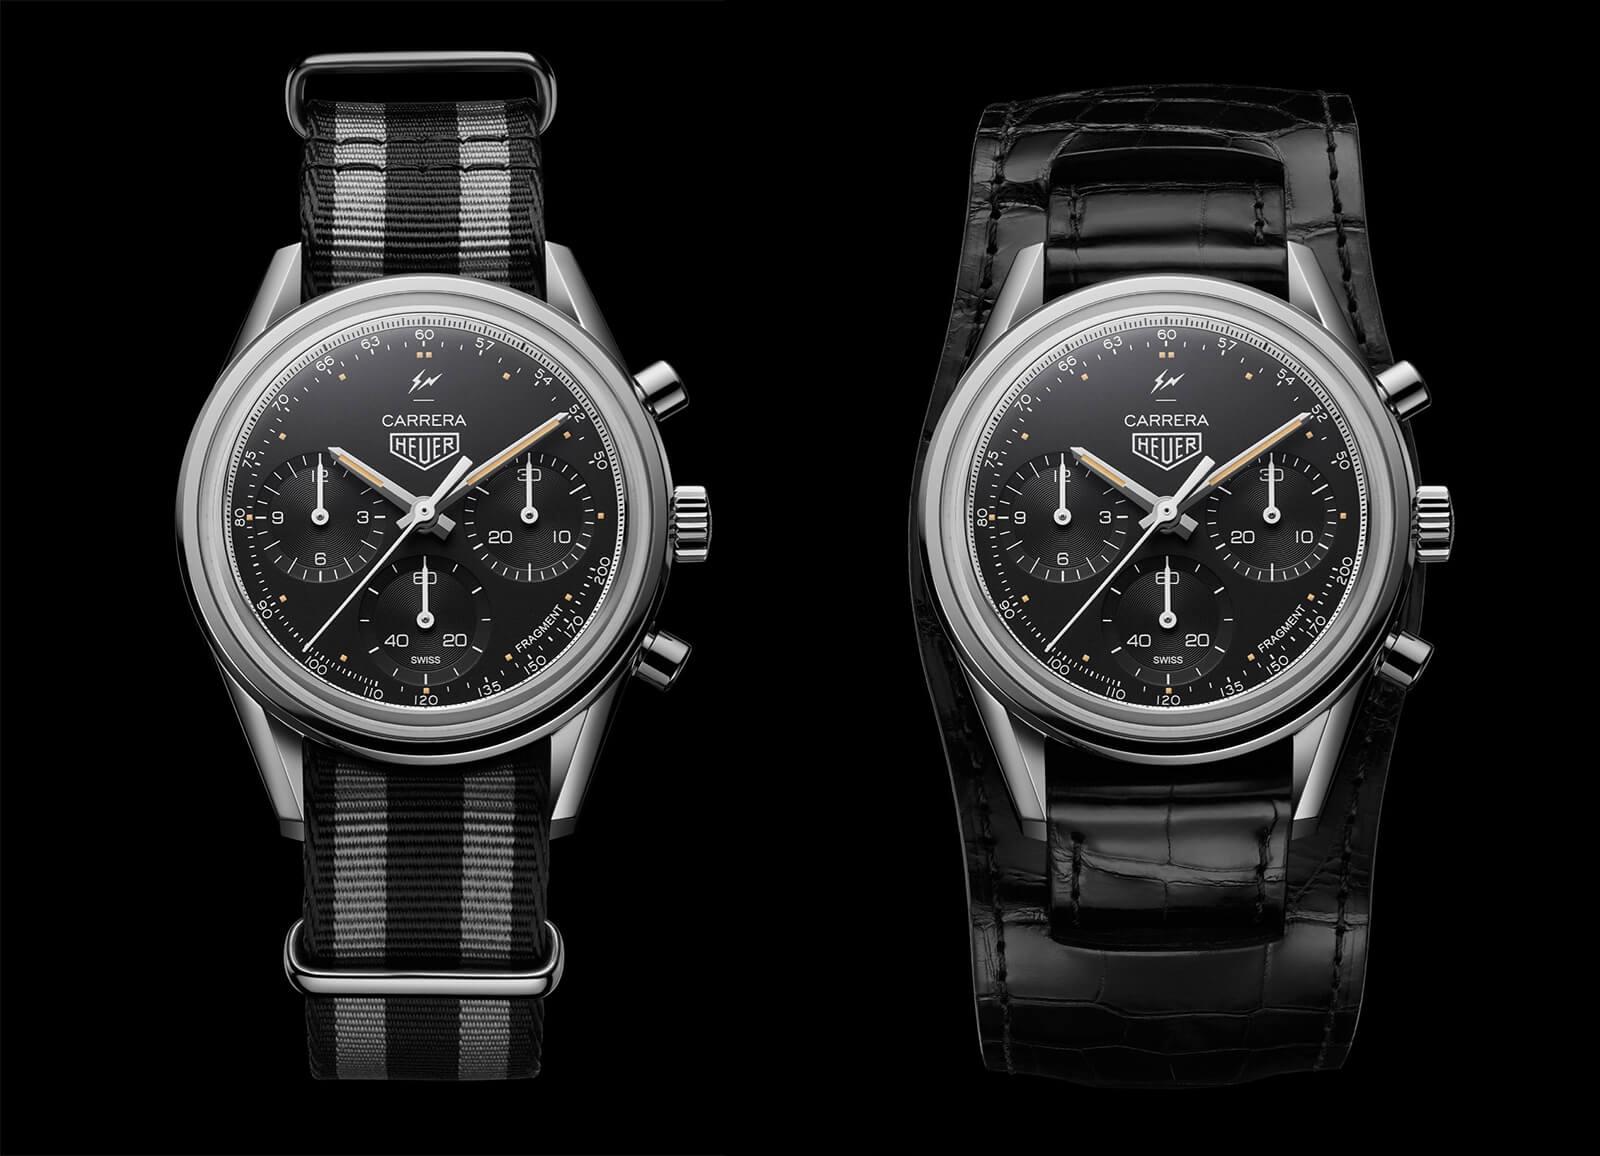 589981bc6239 Introducing the TAG Heuer Carrera Heuer 02 Watch by Fragment Hiroshi  Fujiwara